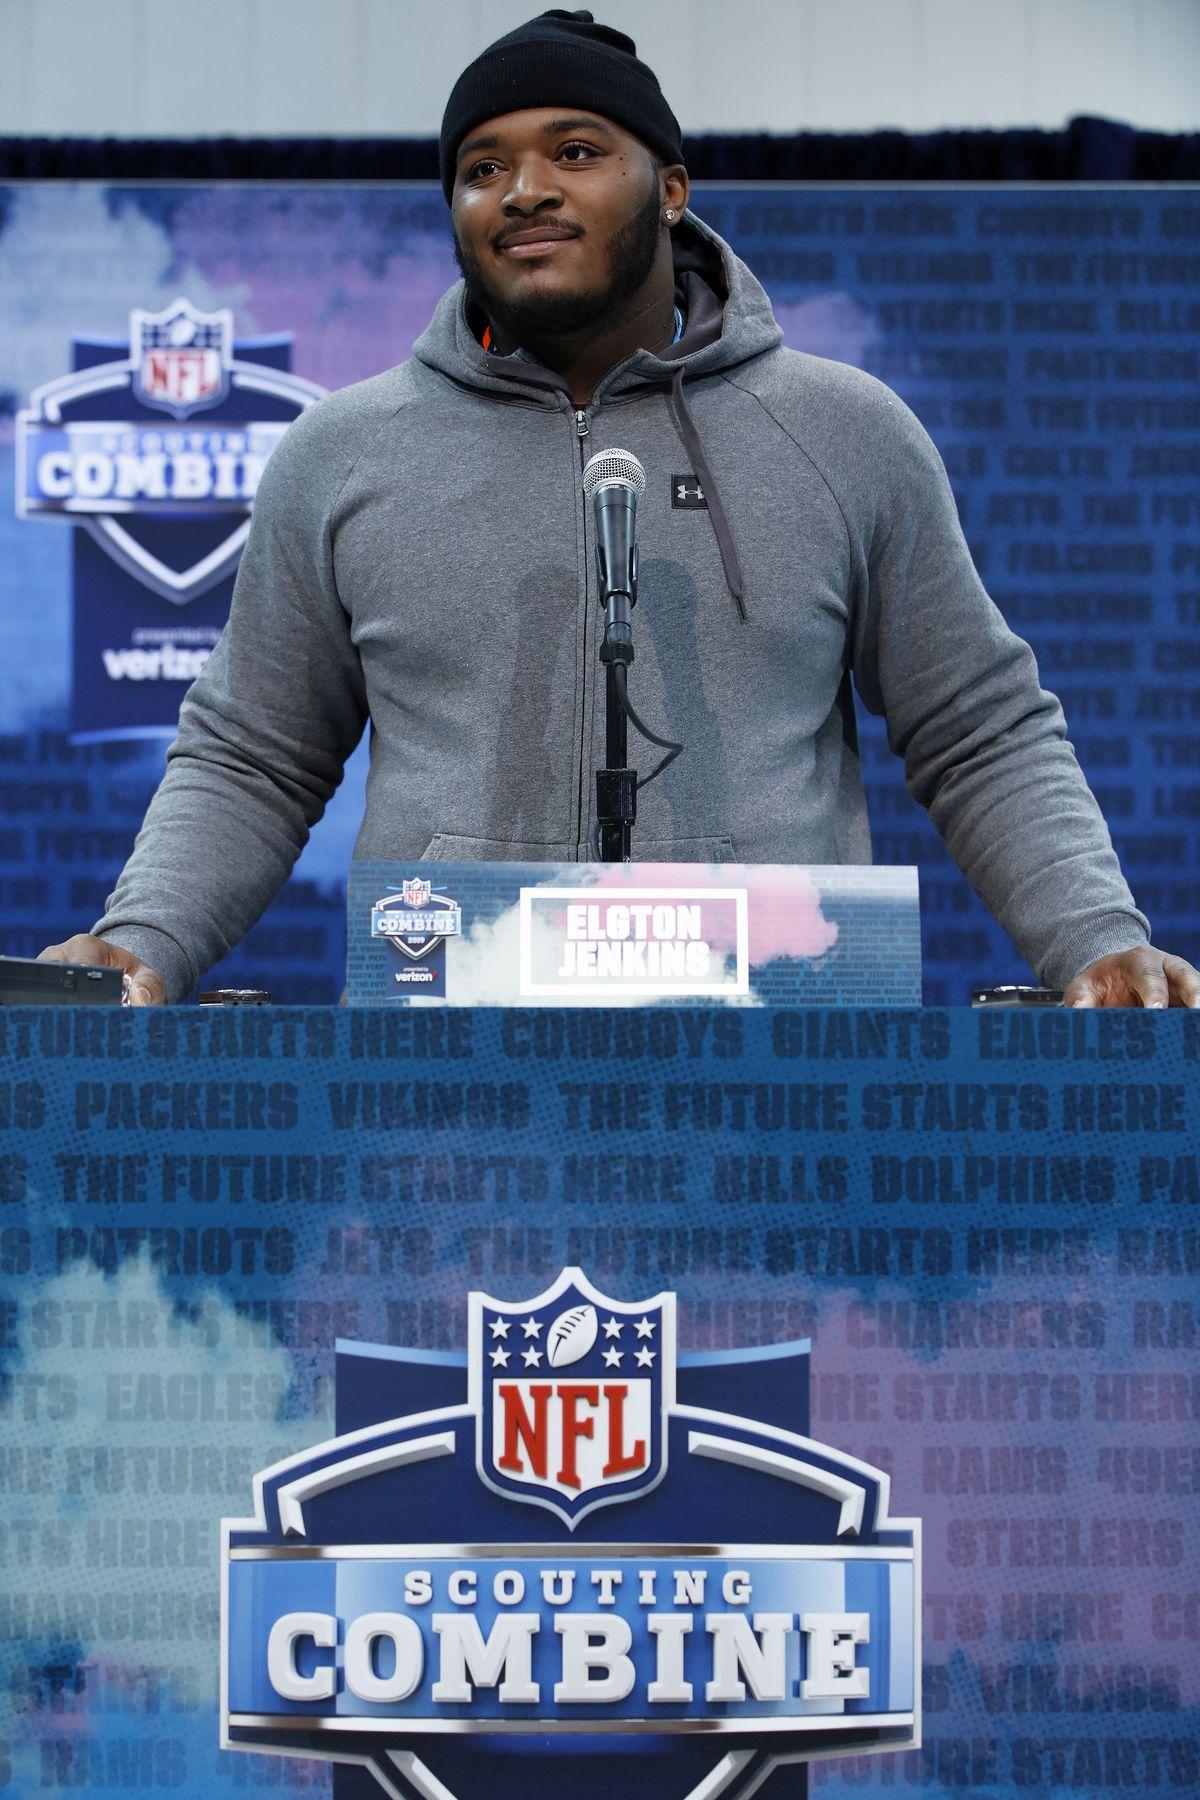 NFL Combine - Day 1